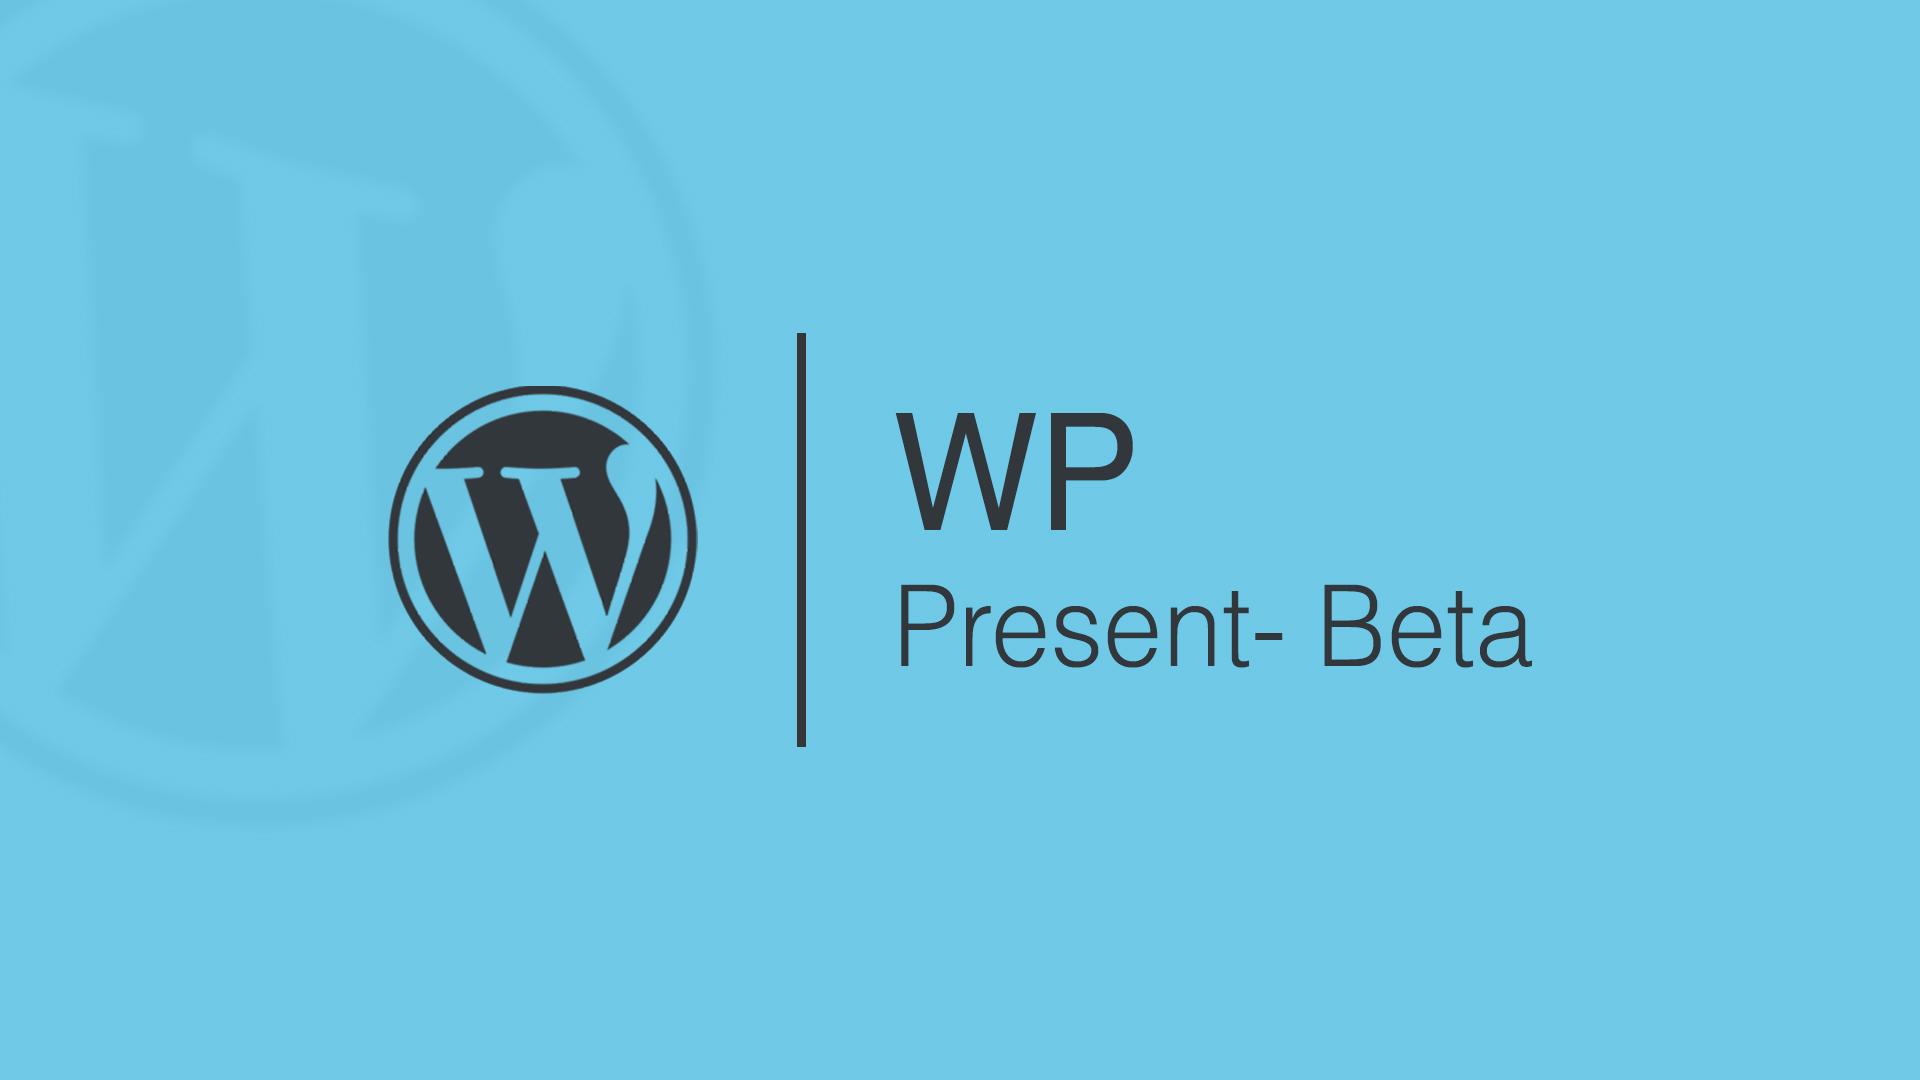 wp-present-beta